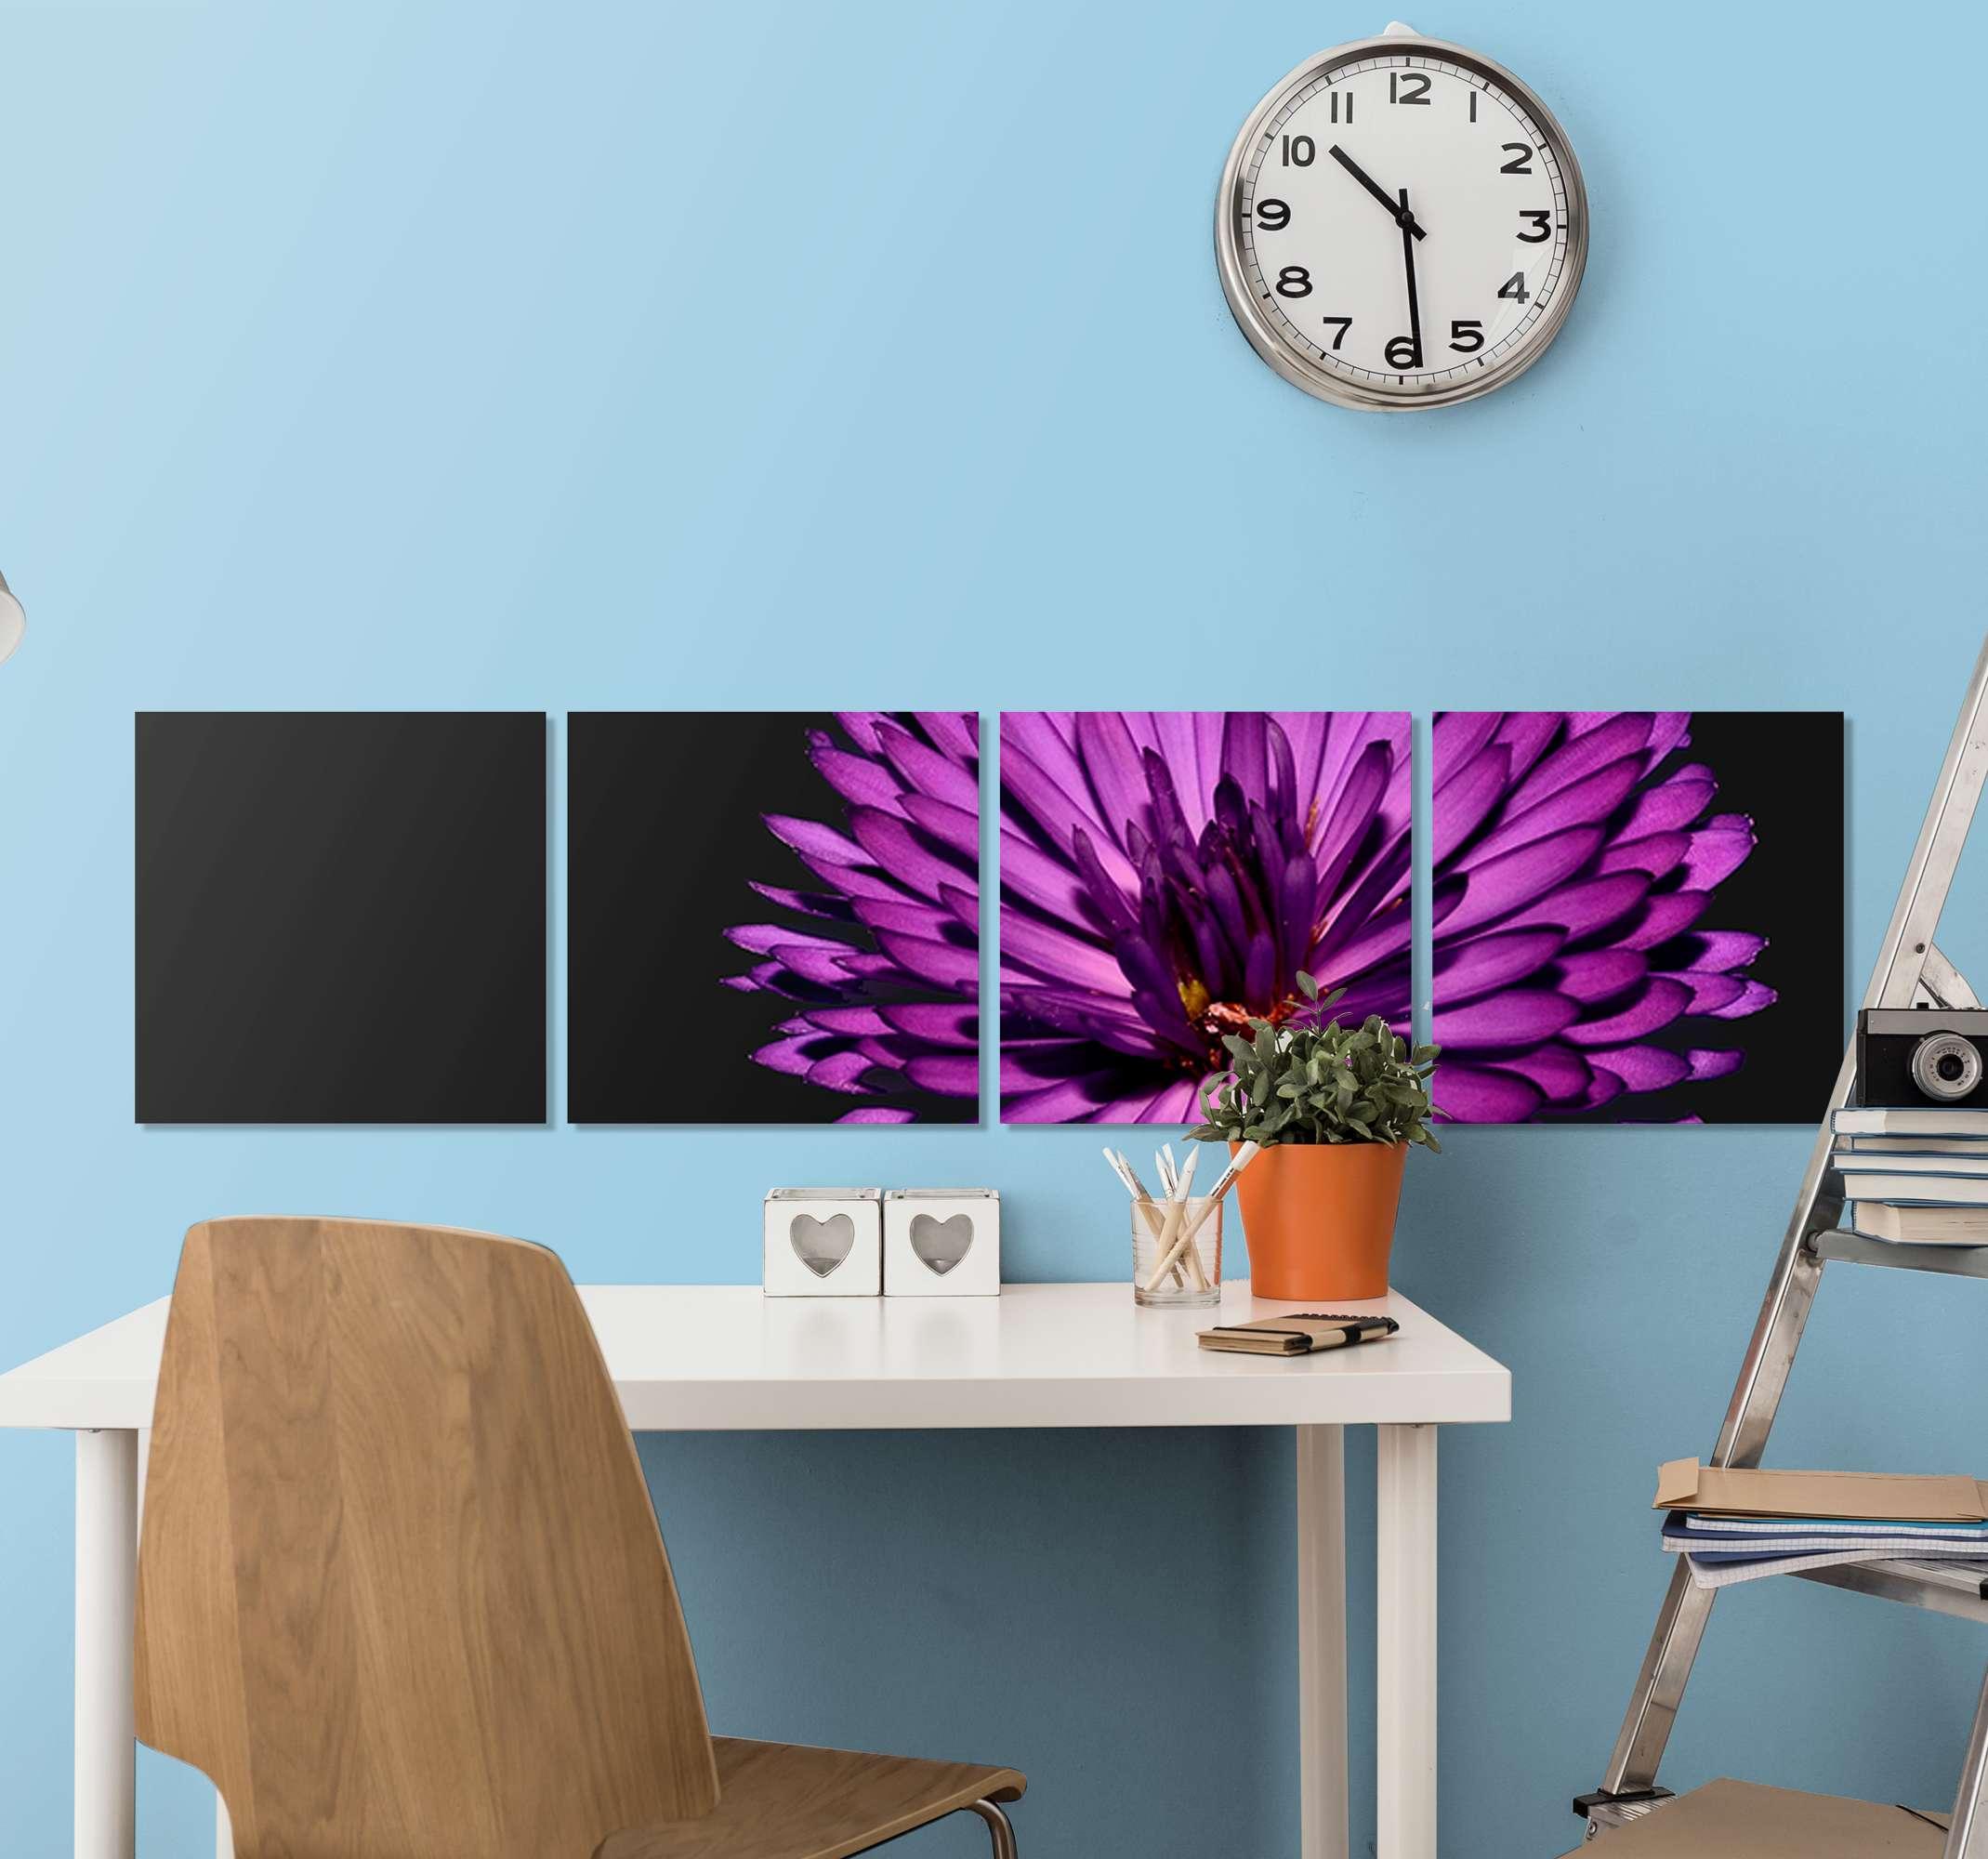 TenStickers. 현대 라일락 꽃 캔버스. 현대 라일락 꽃 벽 캔버스 아트 인쇄 가정, 사무실 및 기타 공간 장식. 원본이며 고품질 마감으로 인쇄되었습니다.